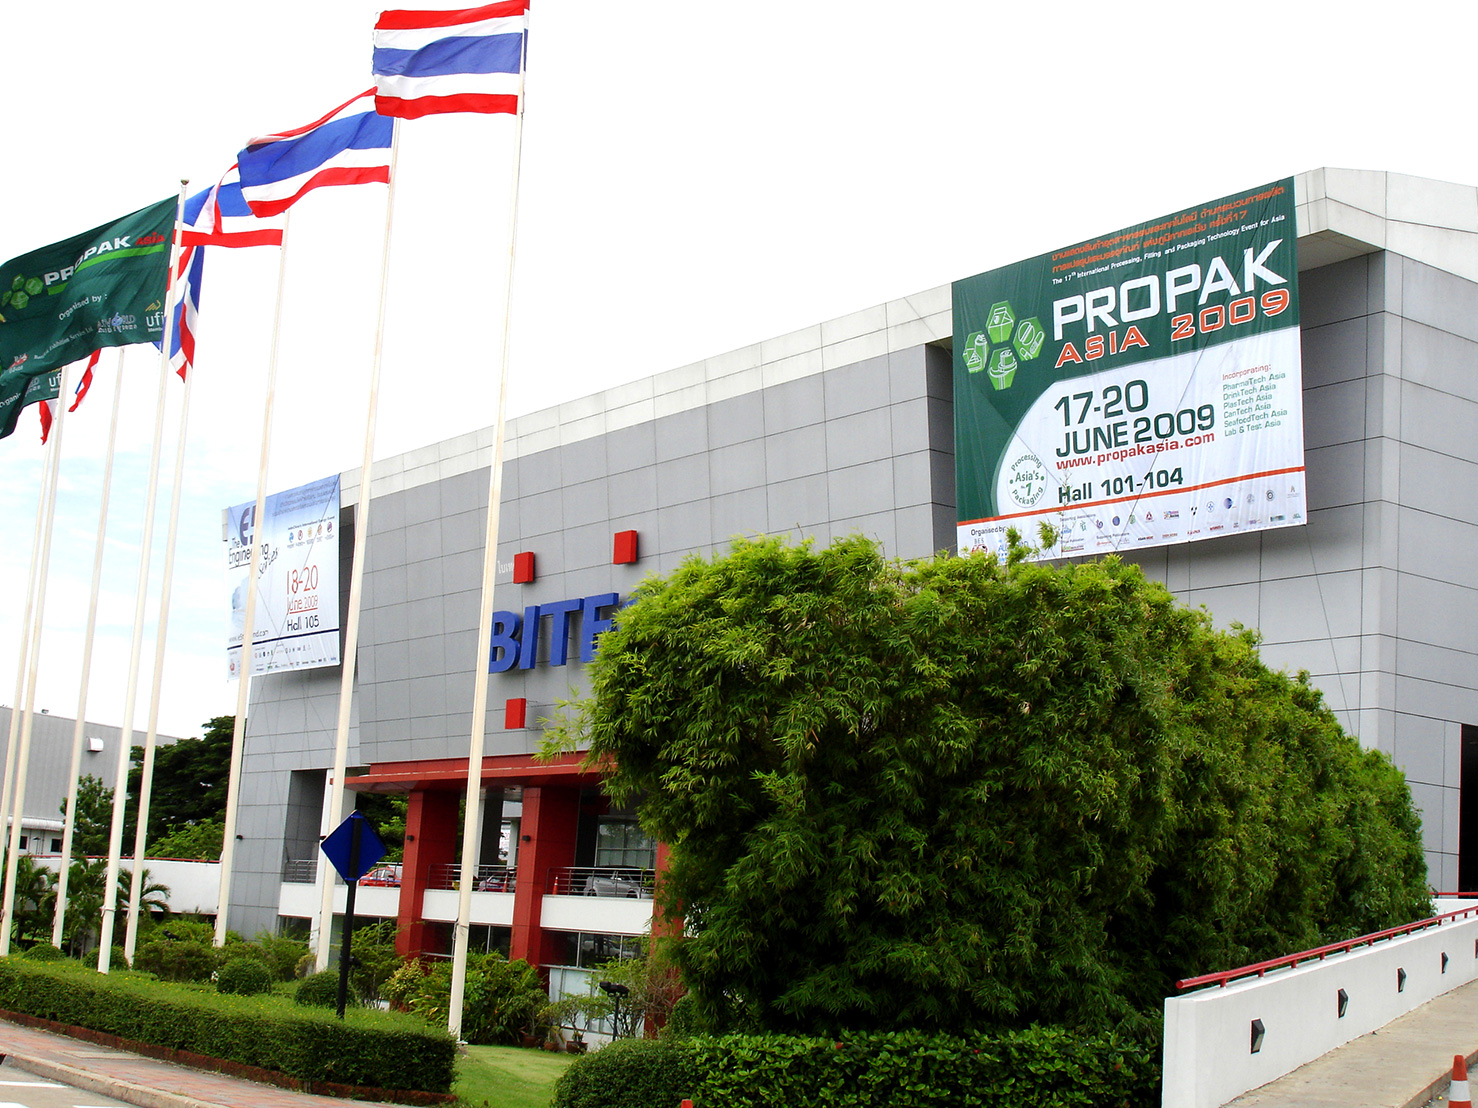 Propak Asia 2009